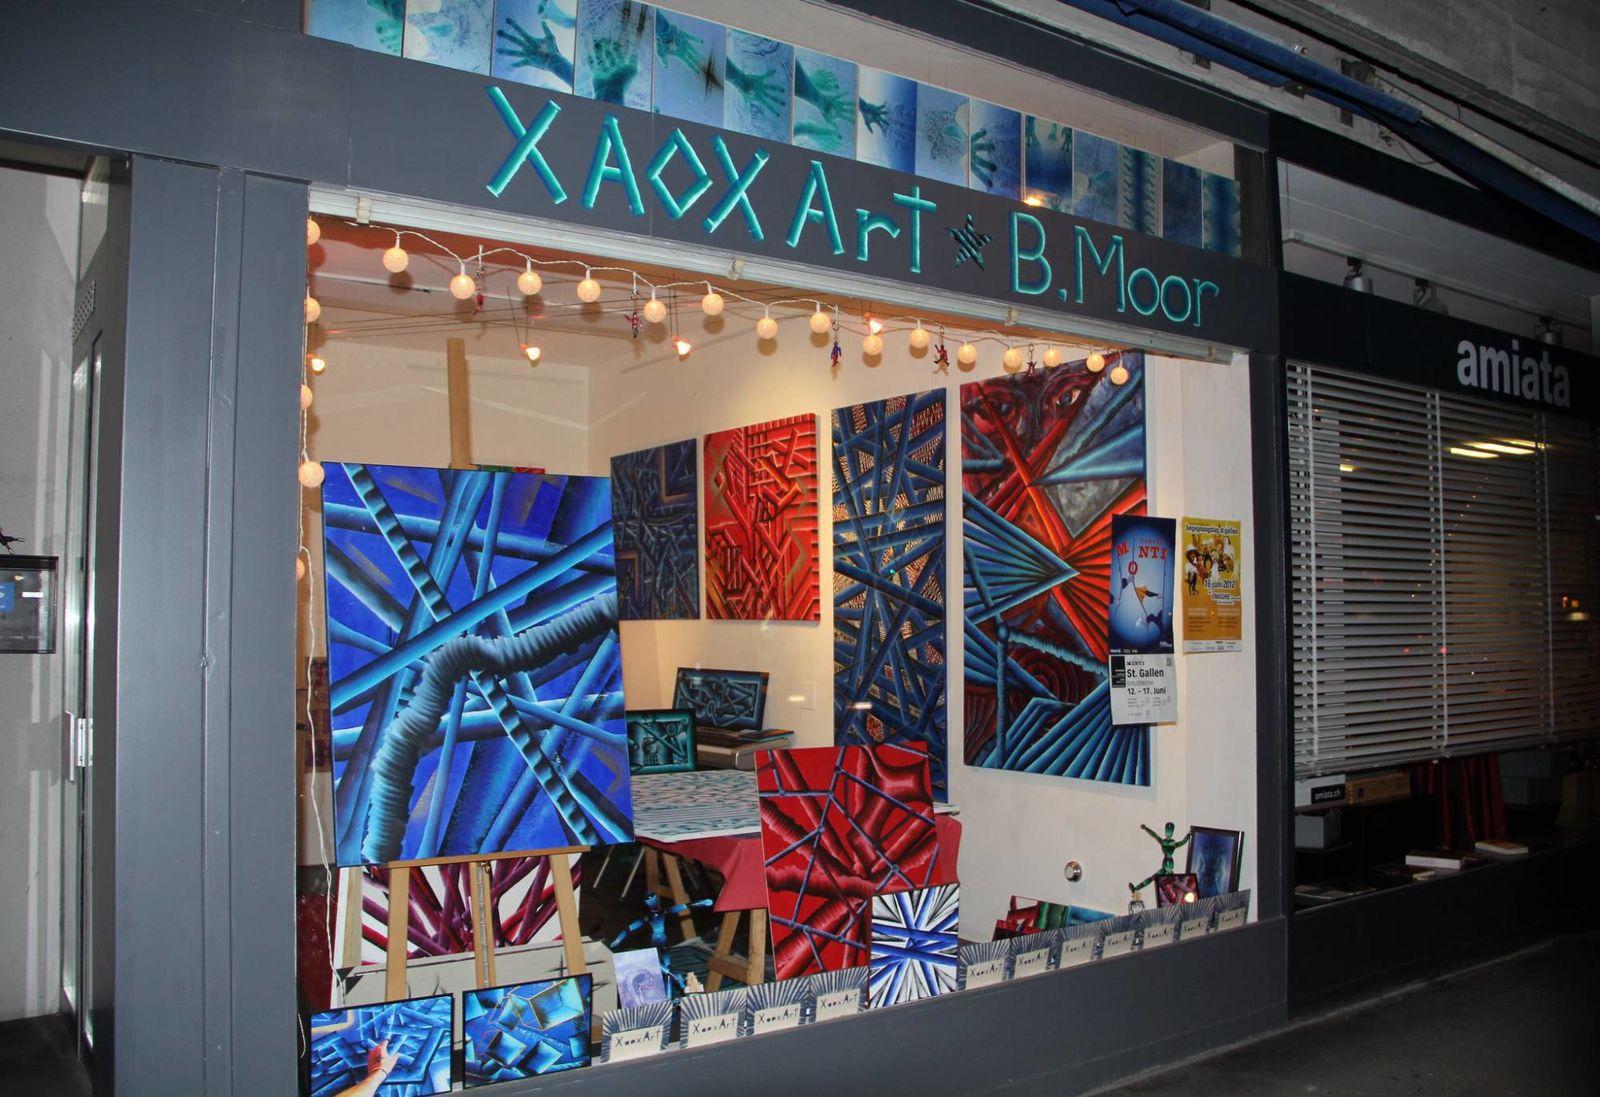 Atelier Galerie Xaoxart